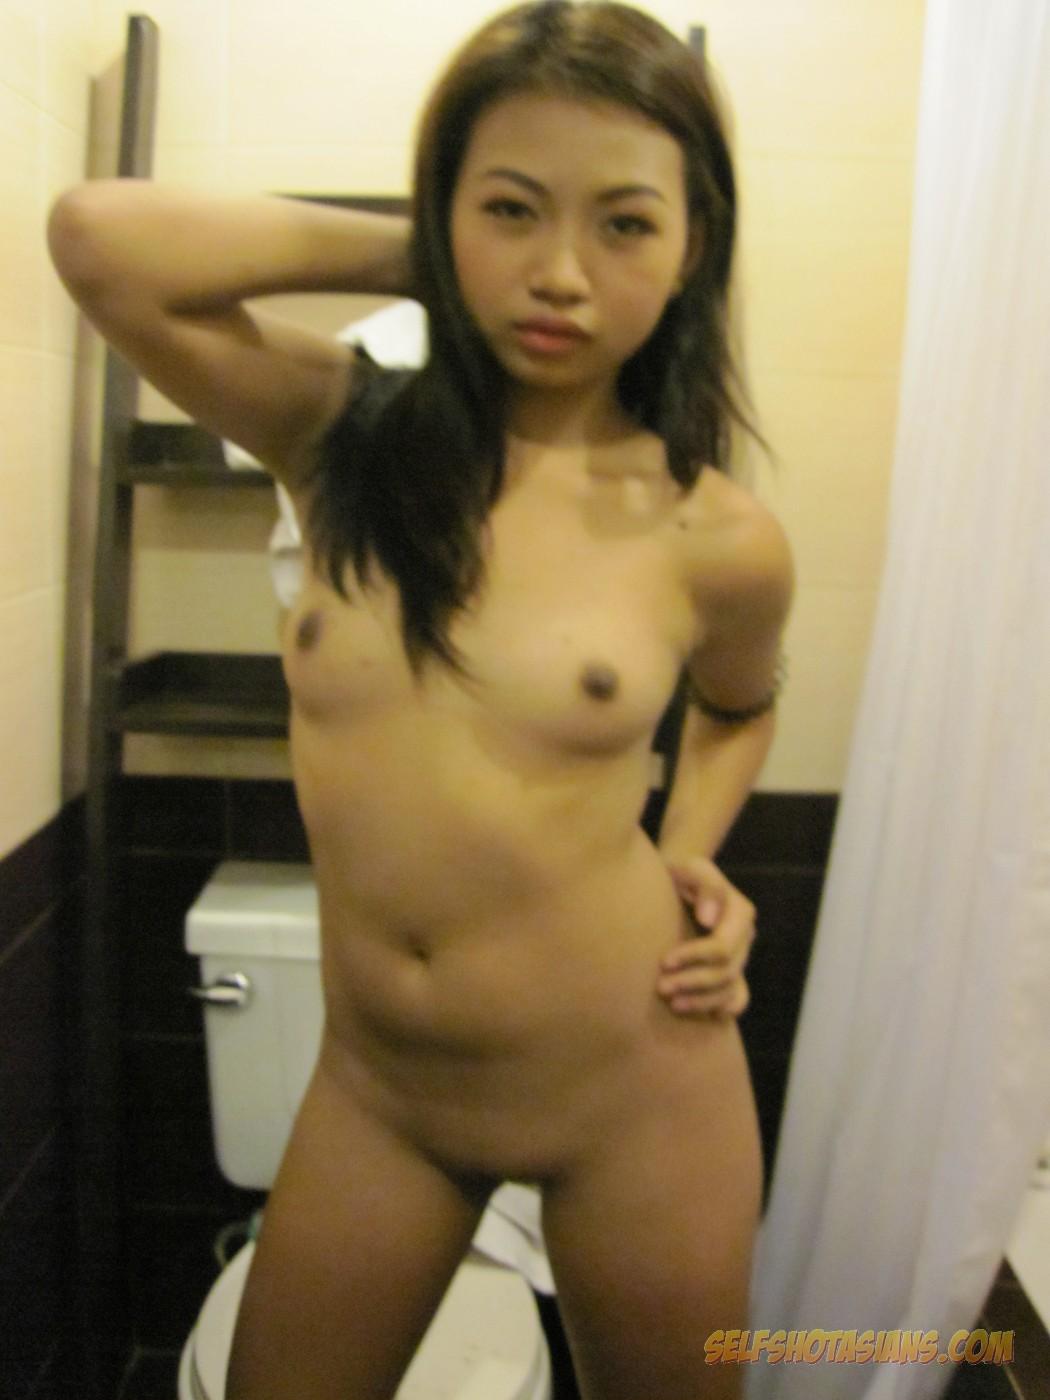 Nude asian girl candid